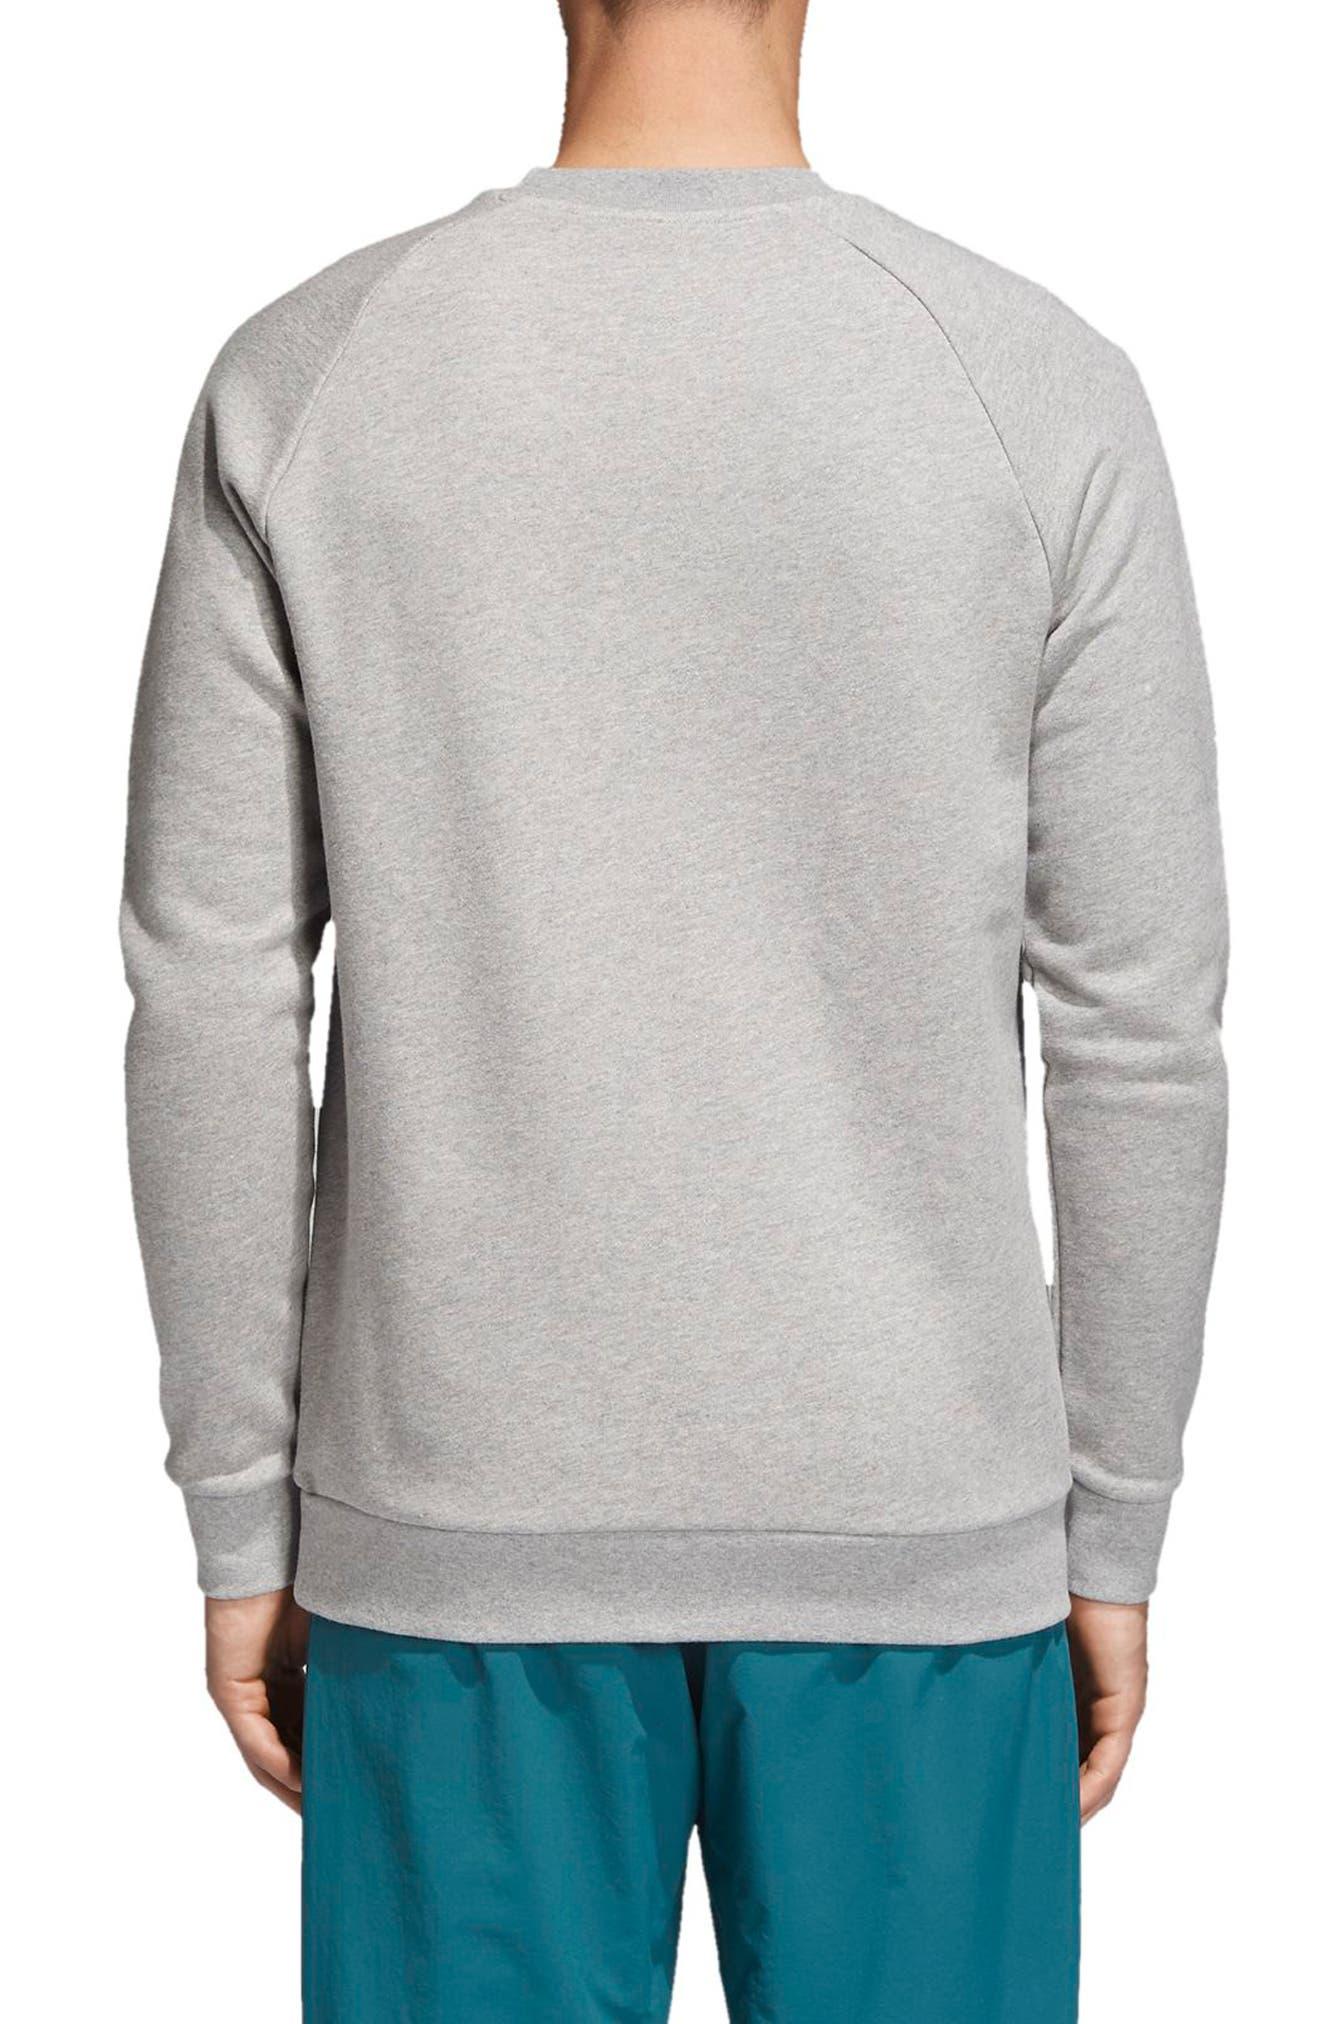 adidas Trefoil Crewneck Sweatshirt,                             Alternate thumbnail 2, color,                             035